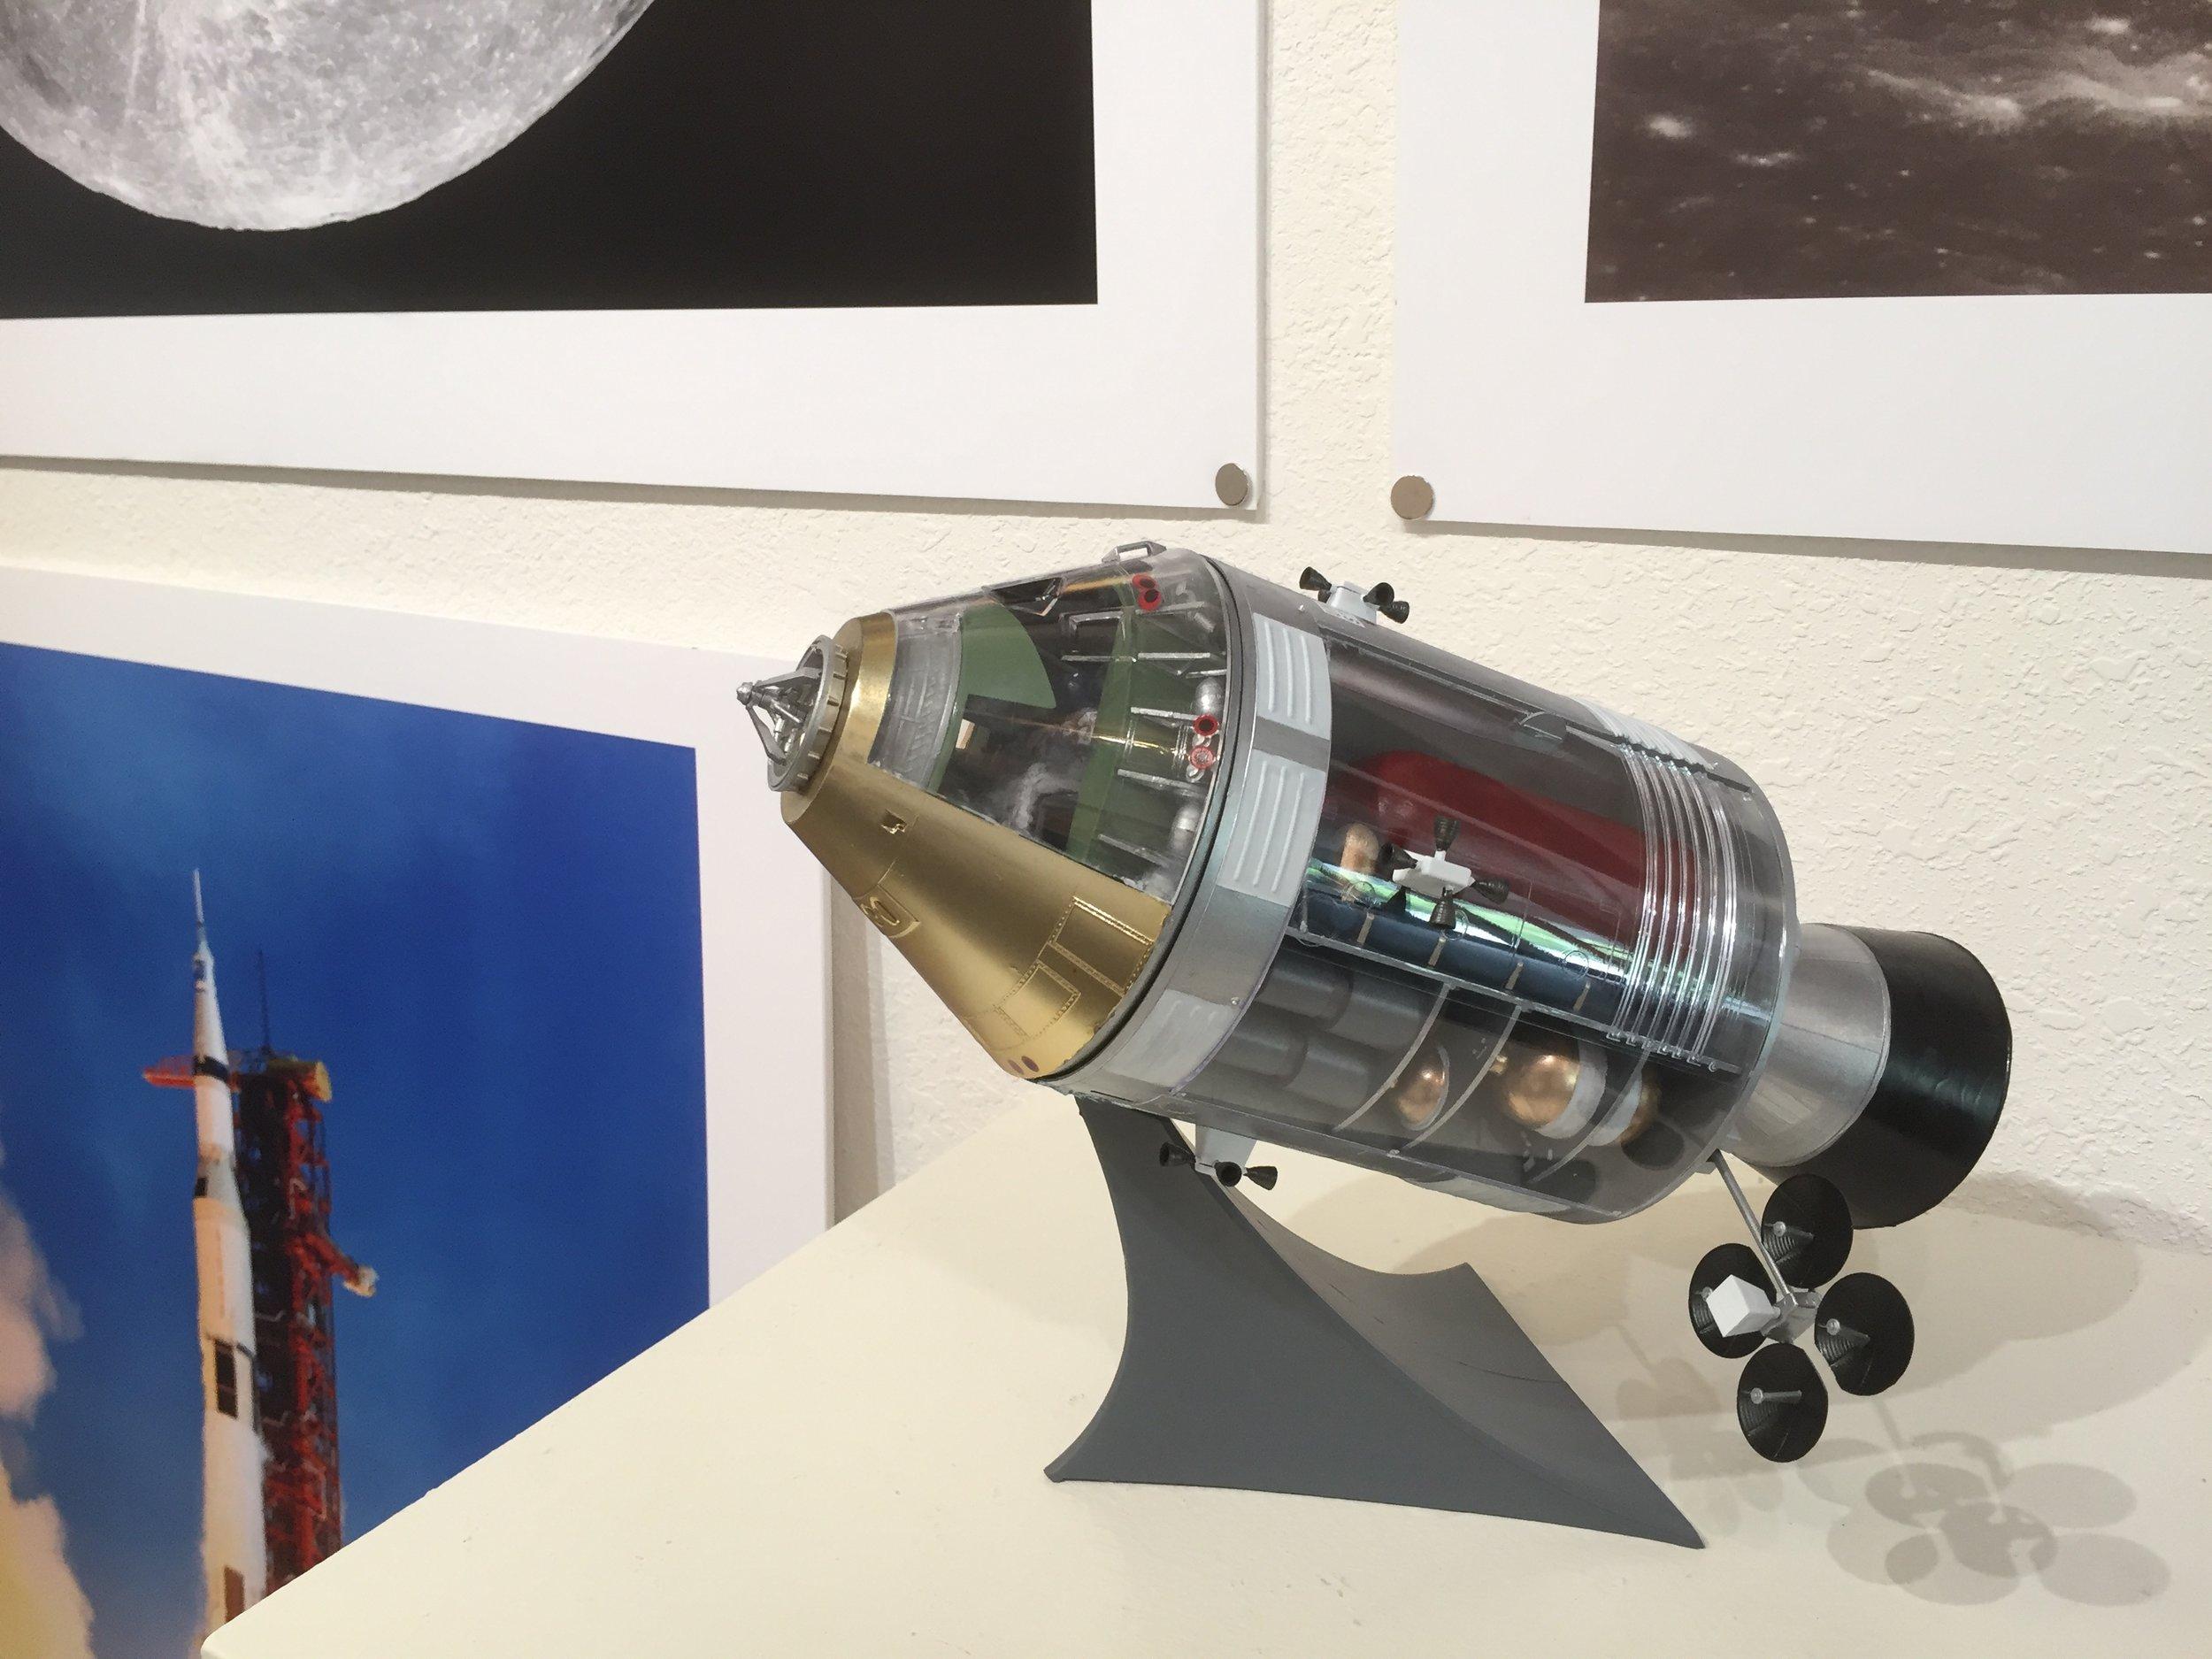 Apollo Command Module Model. Reveal kit built by Alex Dziesinski.